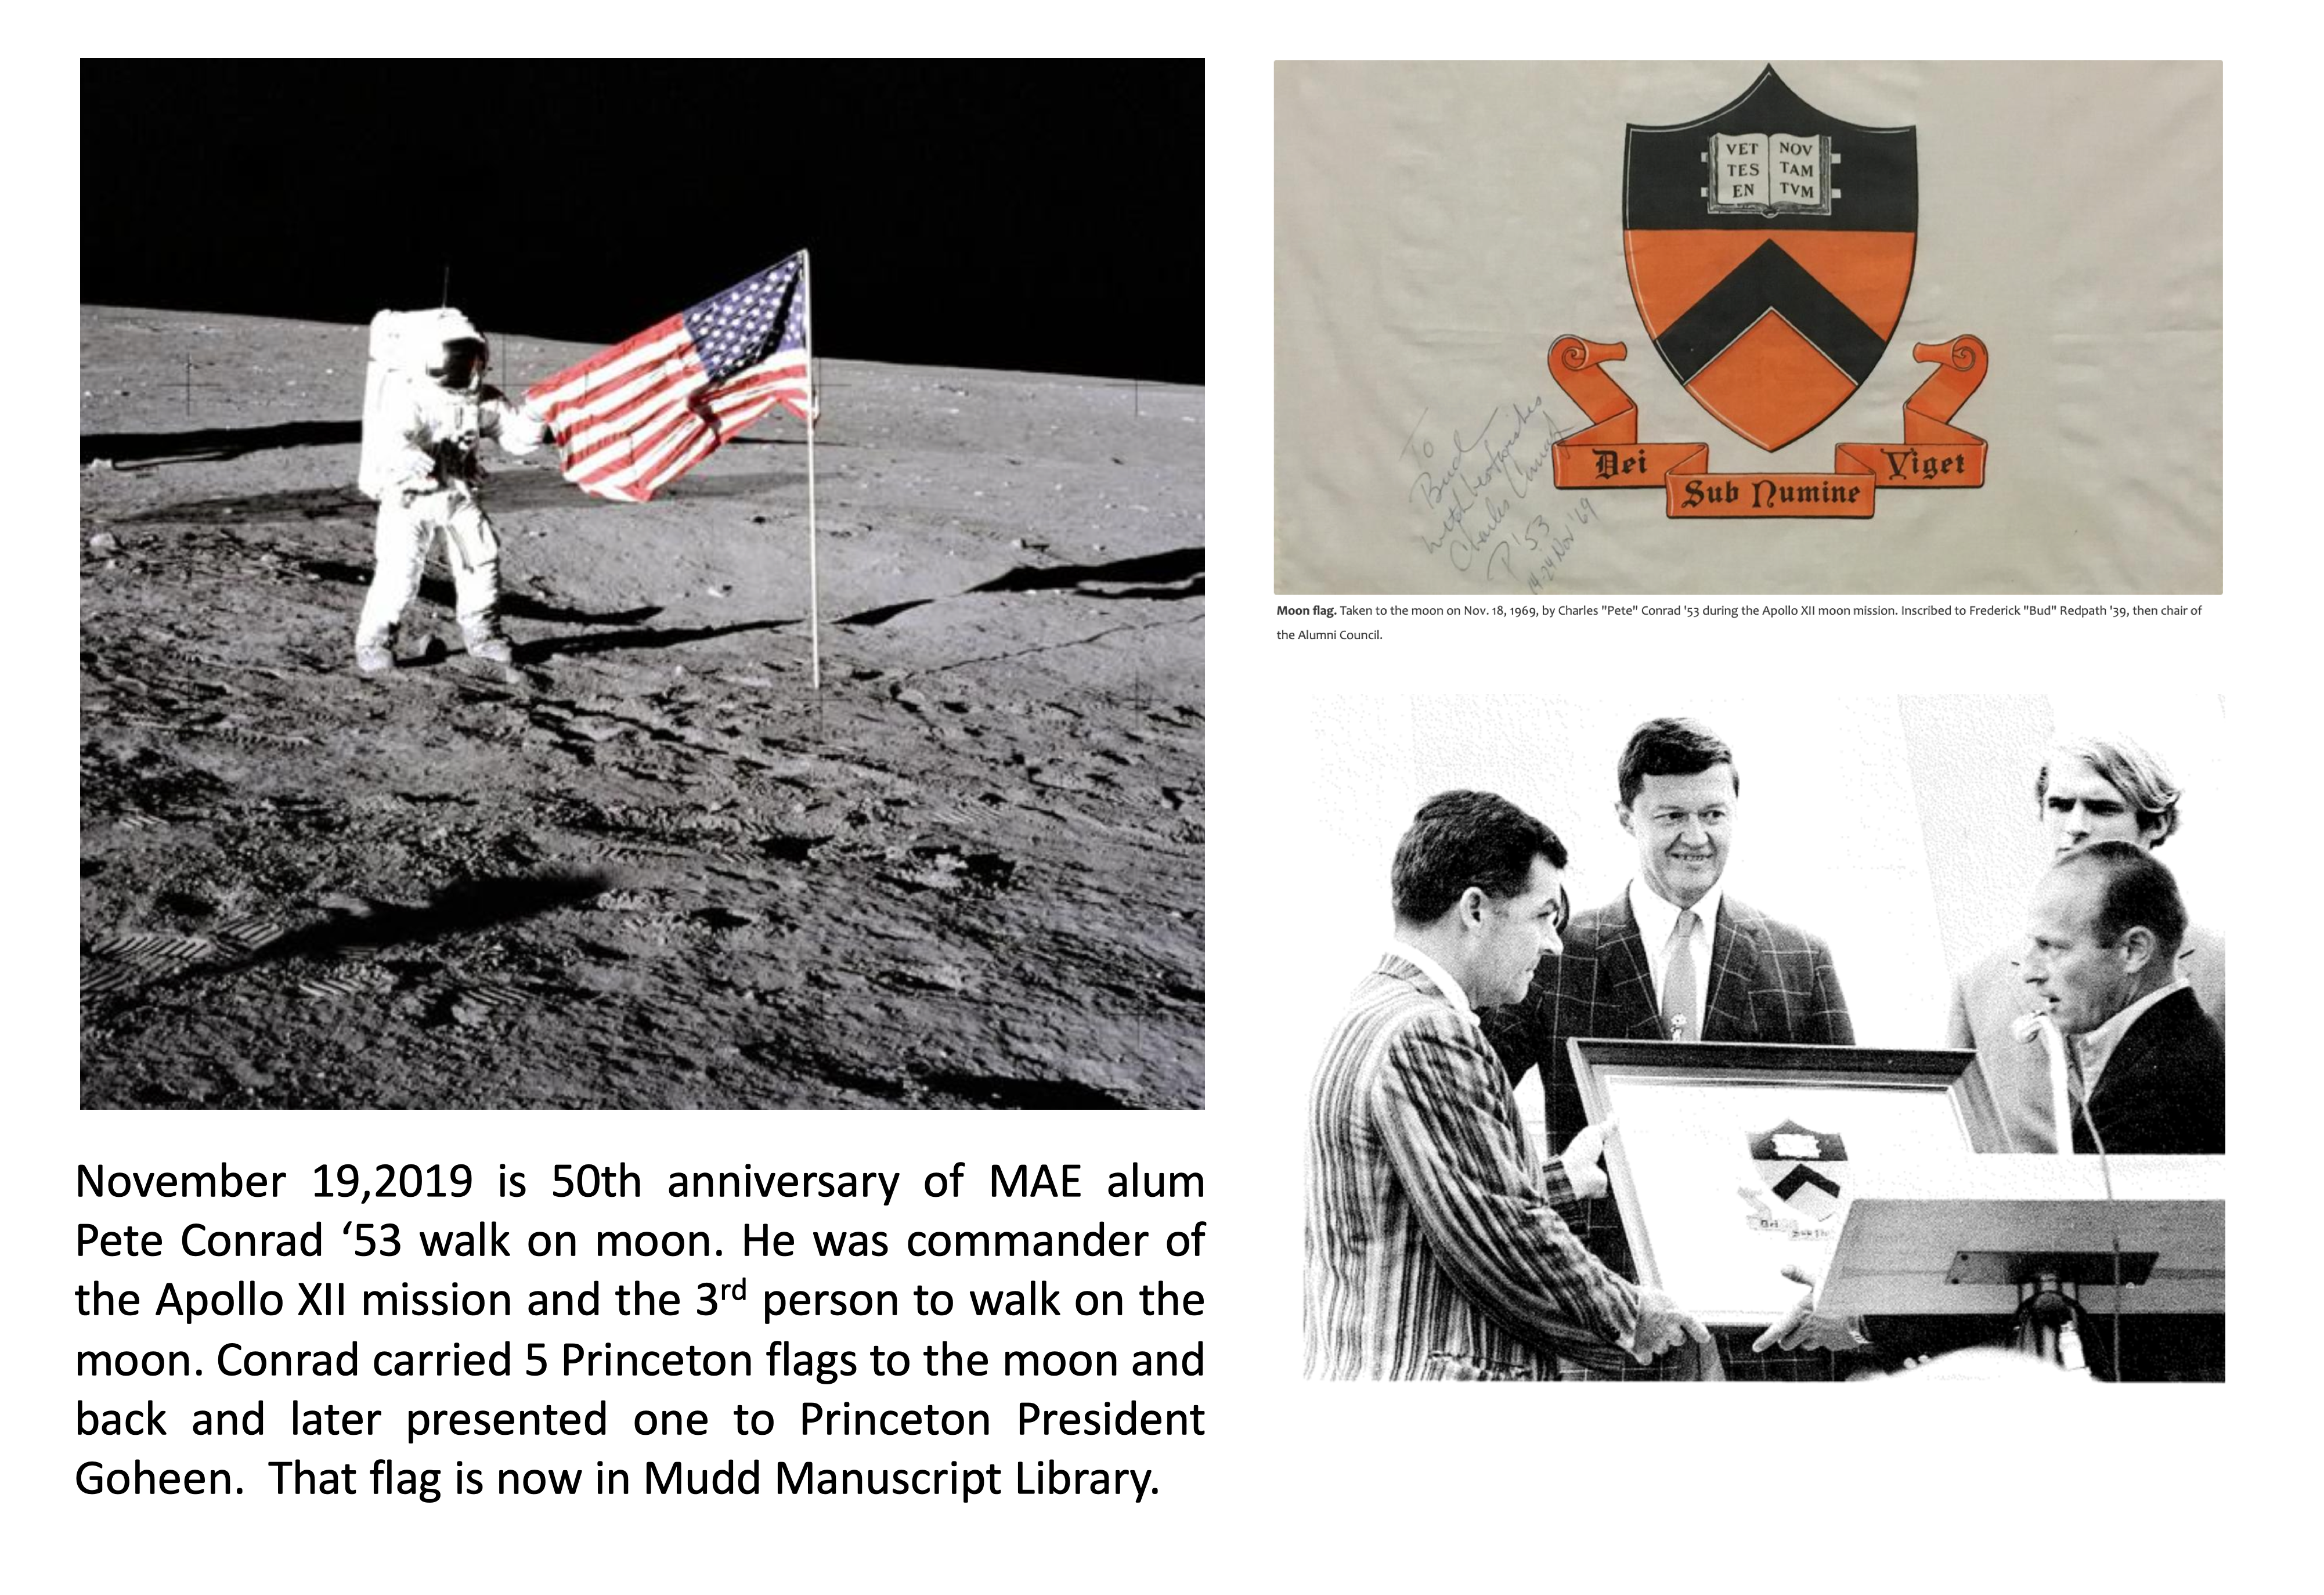 50 years ago - MAE grad Pete Conrad '53 commands the Apollo XII mission to the moon